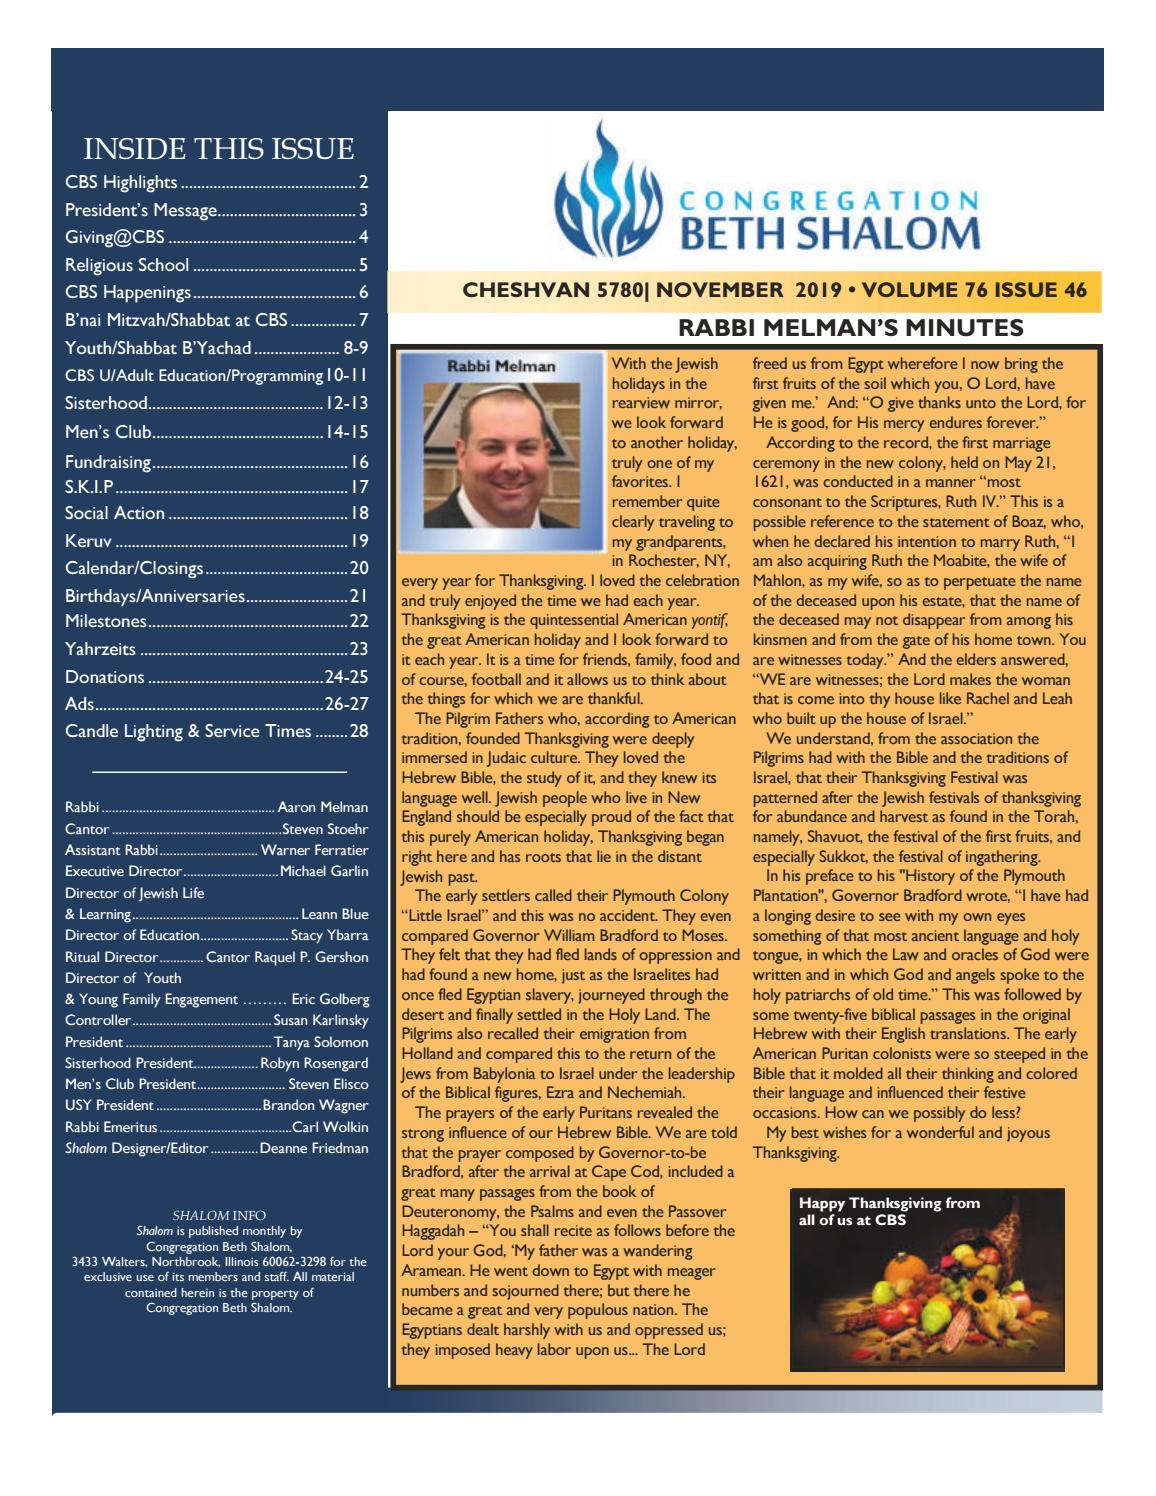 Congregation Beth Shalom November 2019 Bulletin by dfriedman - issuu